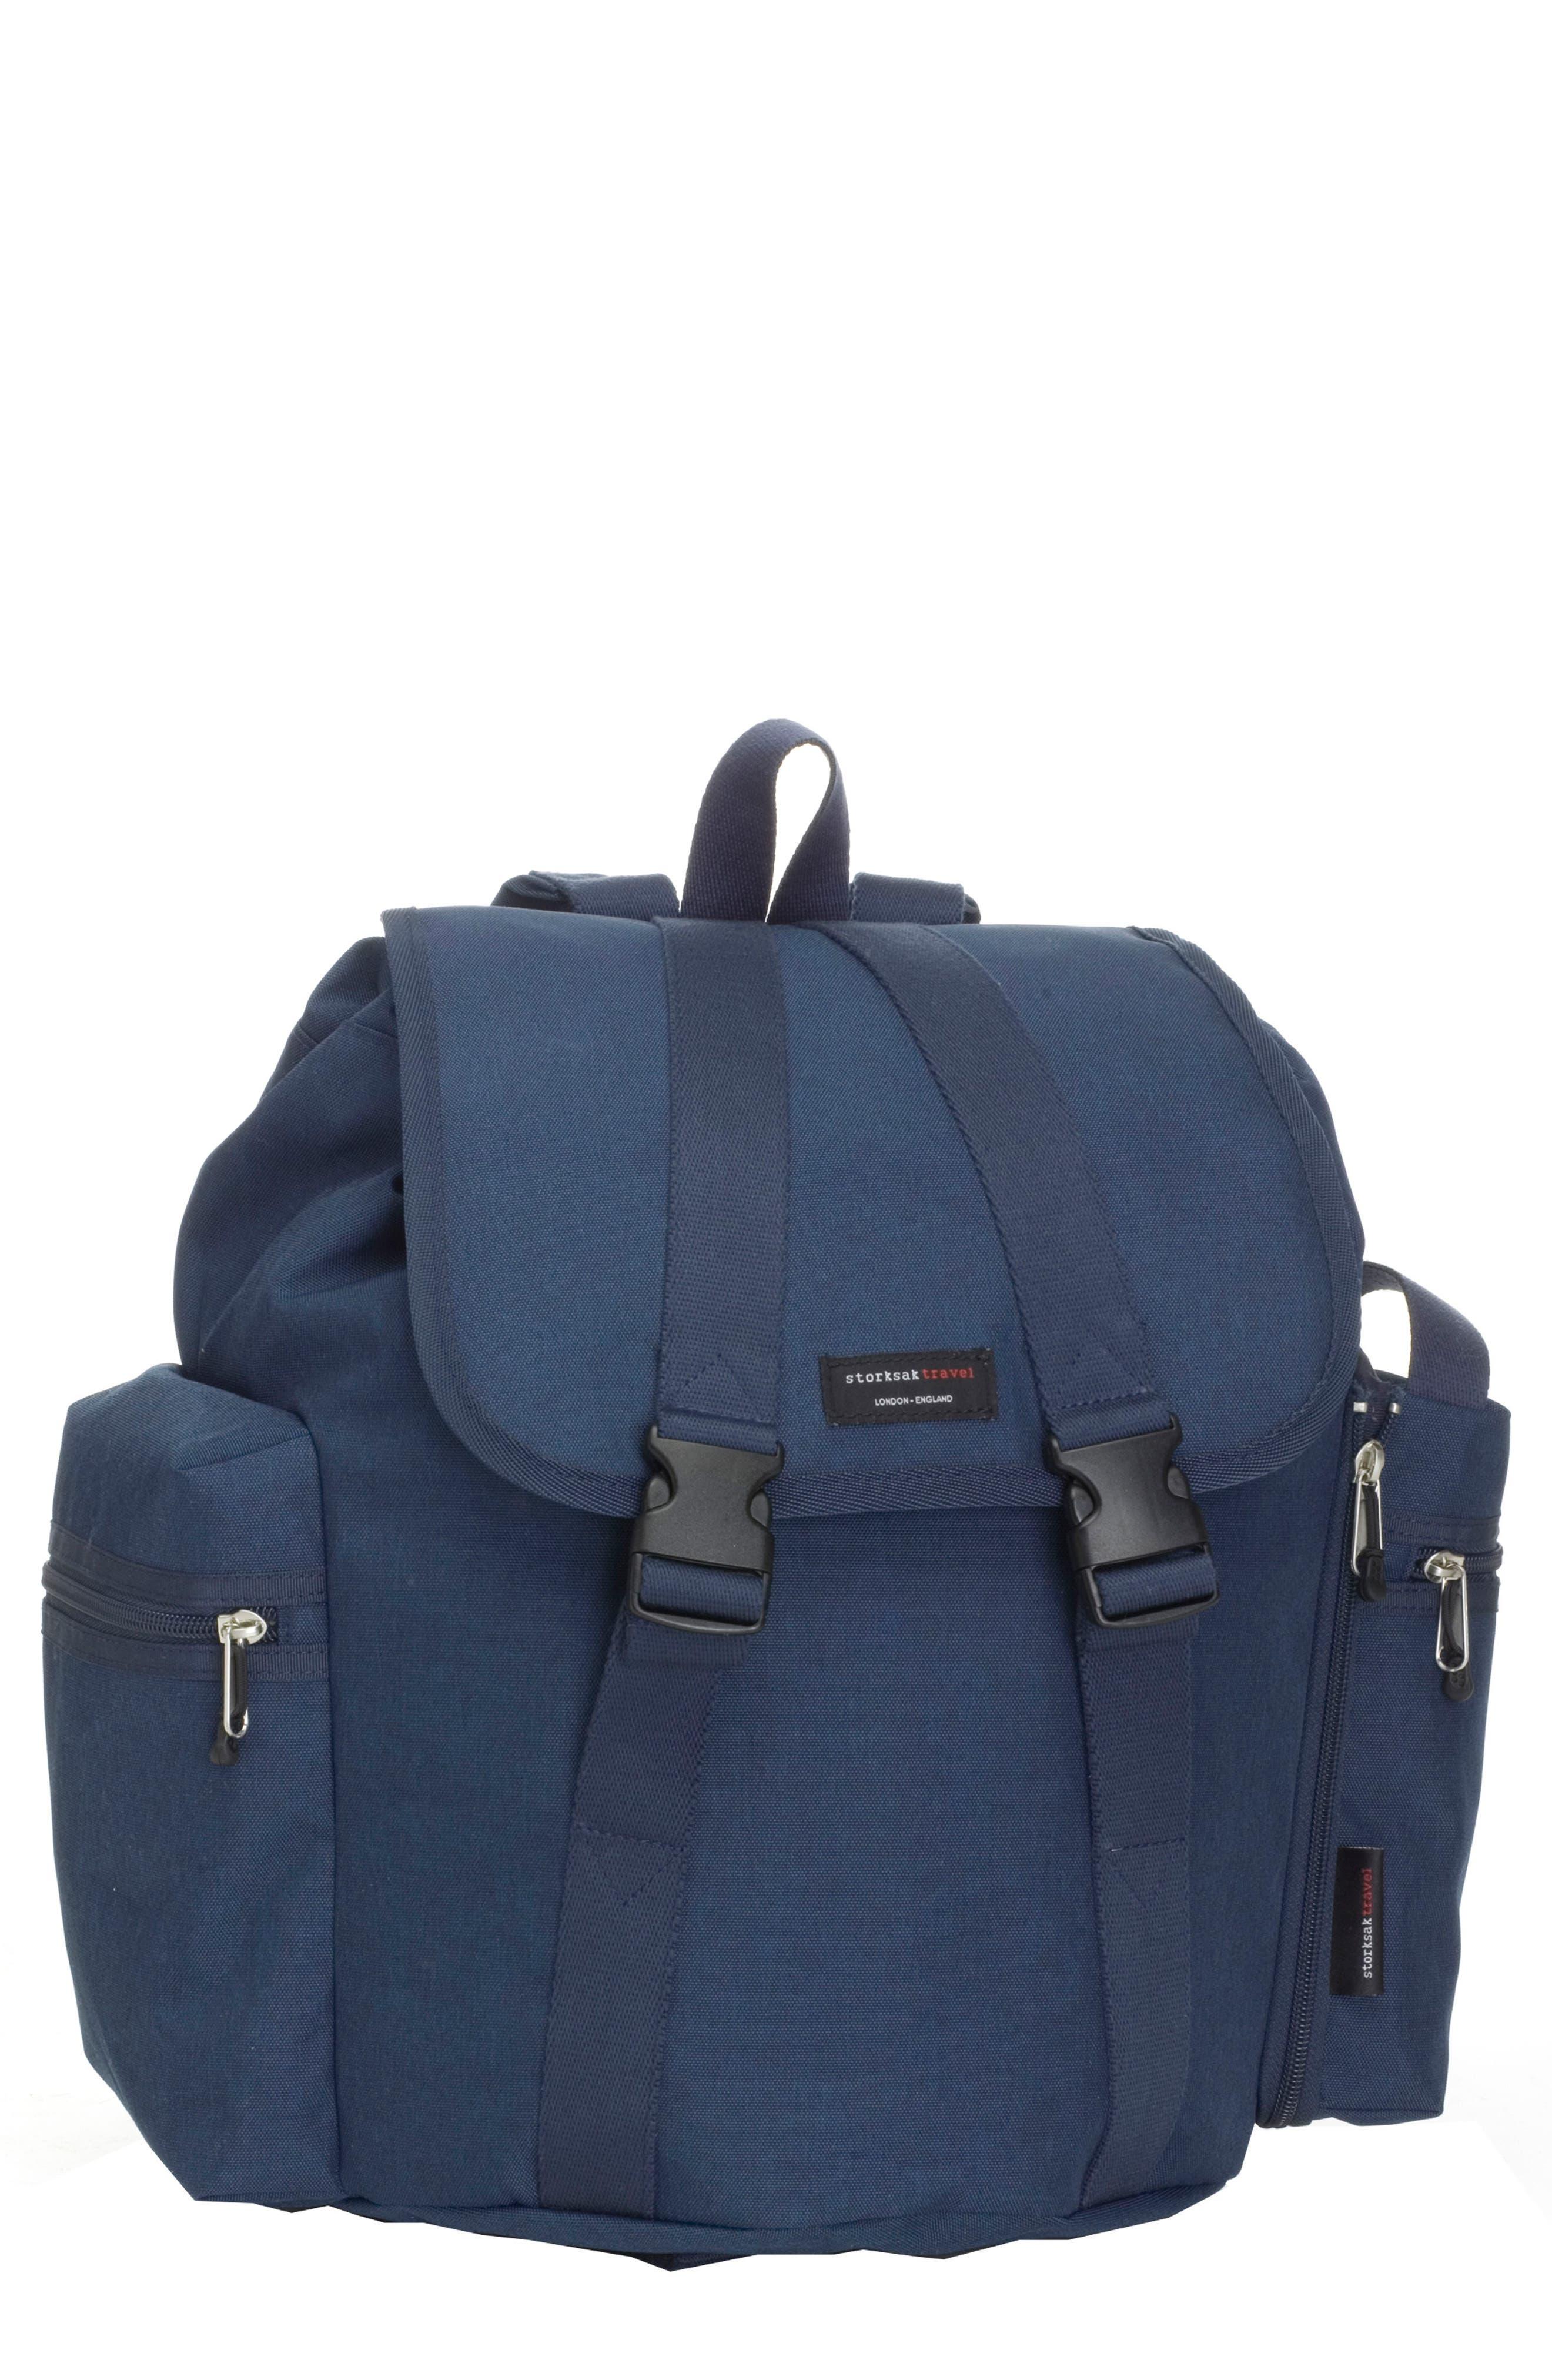 Travel Backpack Diaper Bag,                             Main thumbnail 1, color,                             Navy